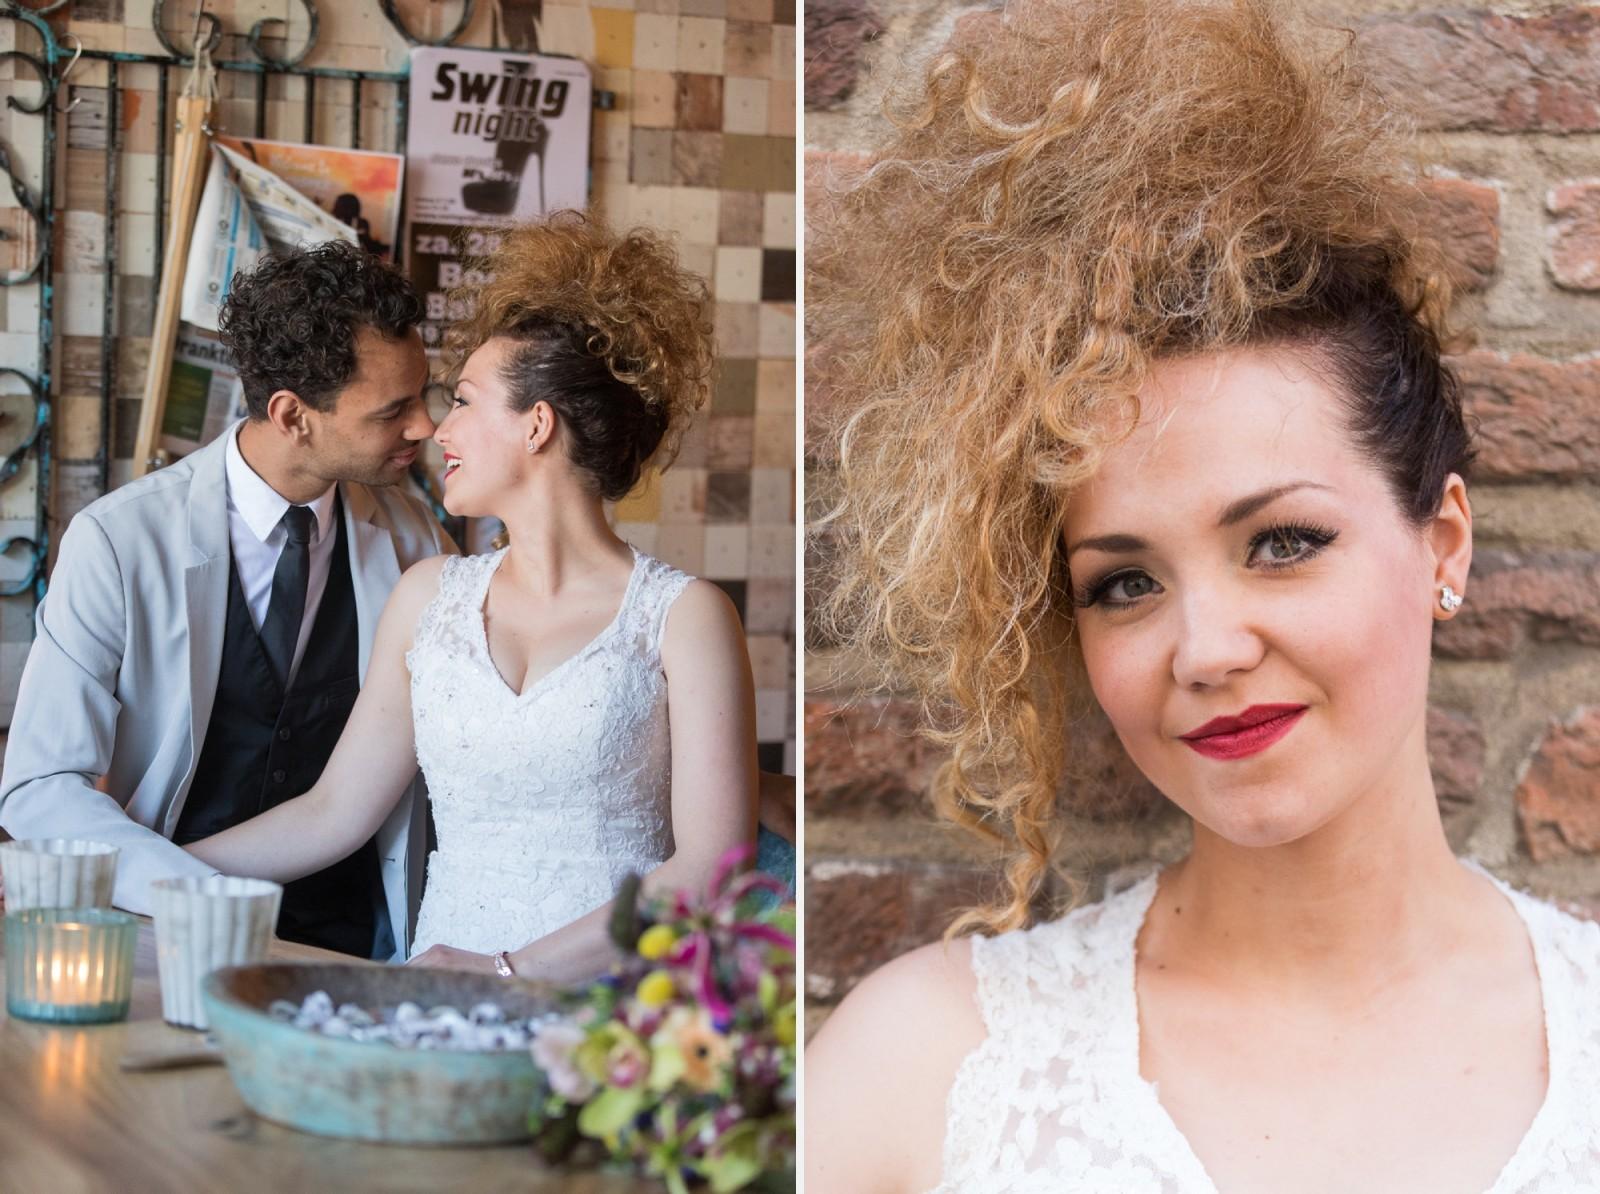 Bruidsrepotage bij St. Tropez in Deventer